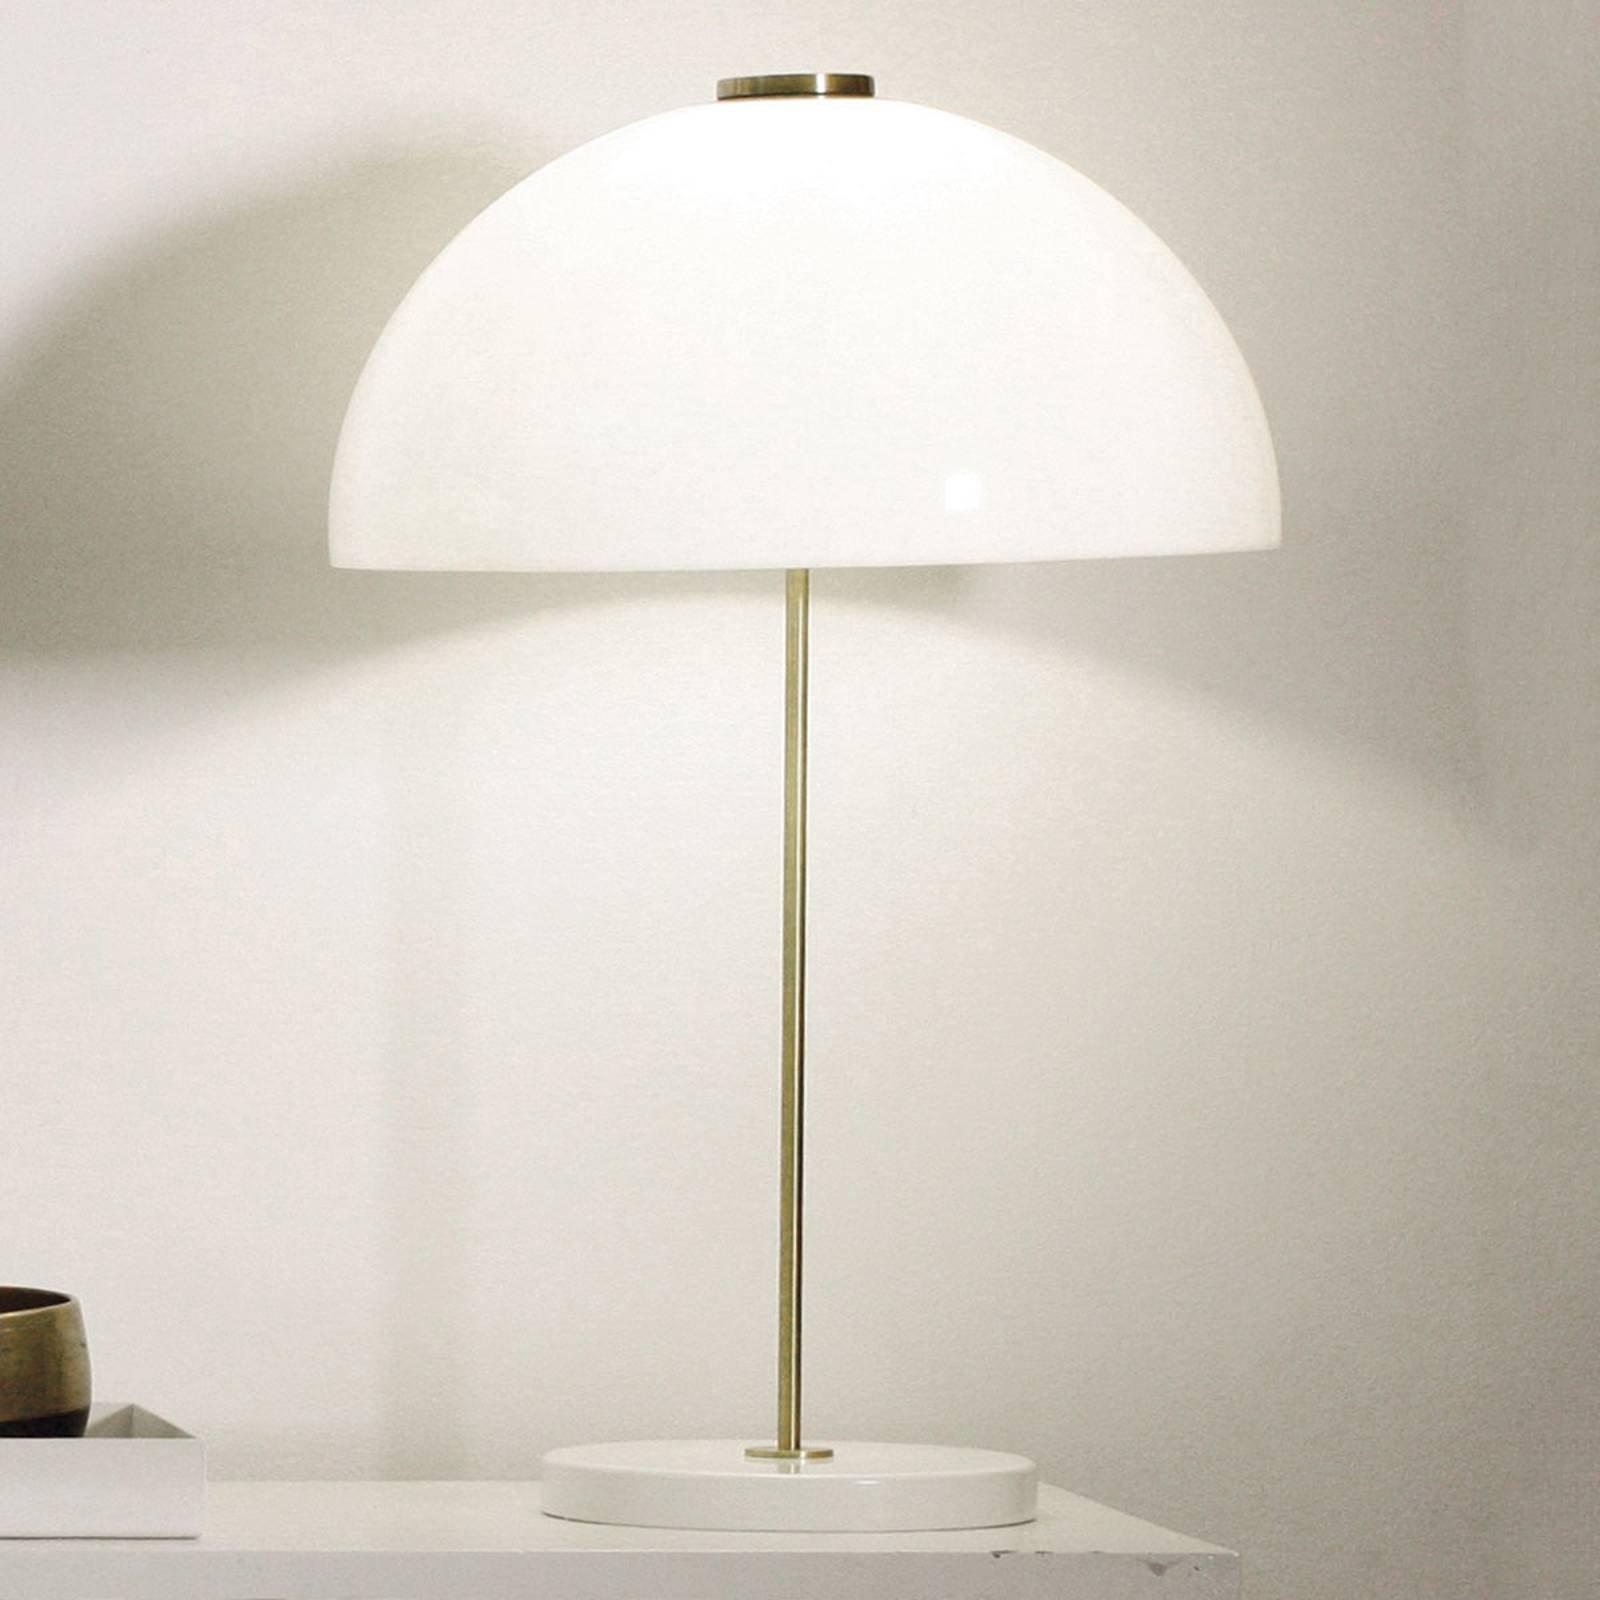 Innolux Kupoli bordlampe, hvit fot